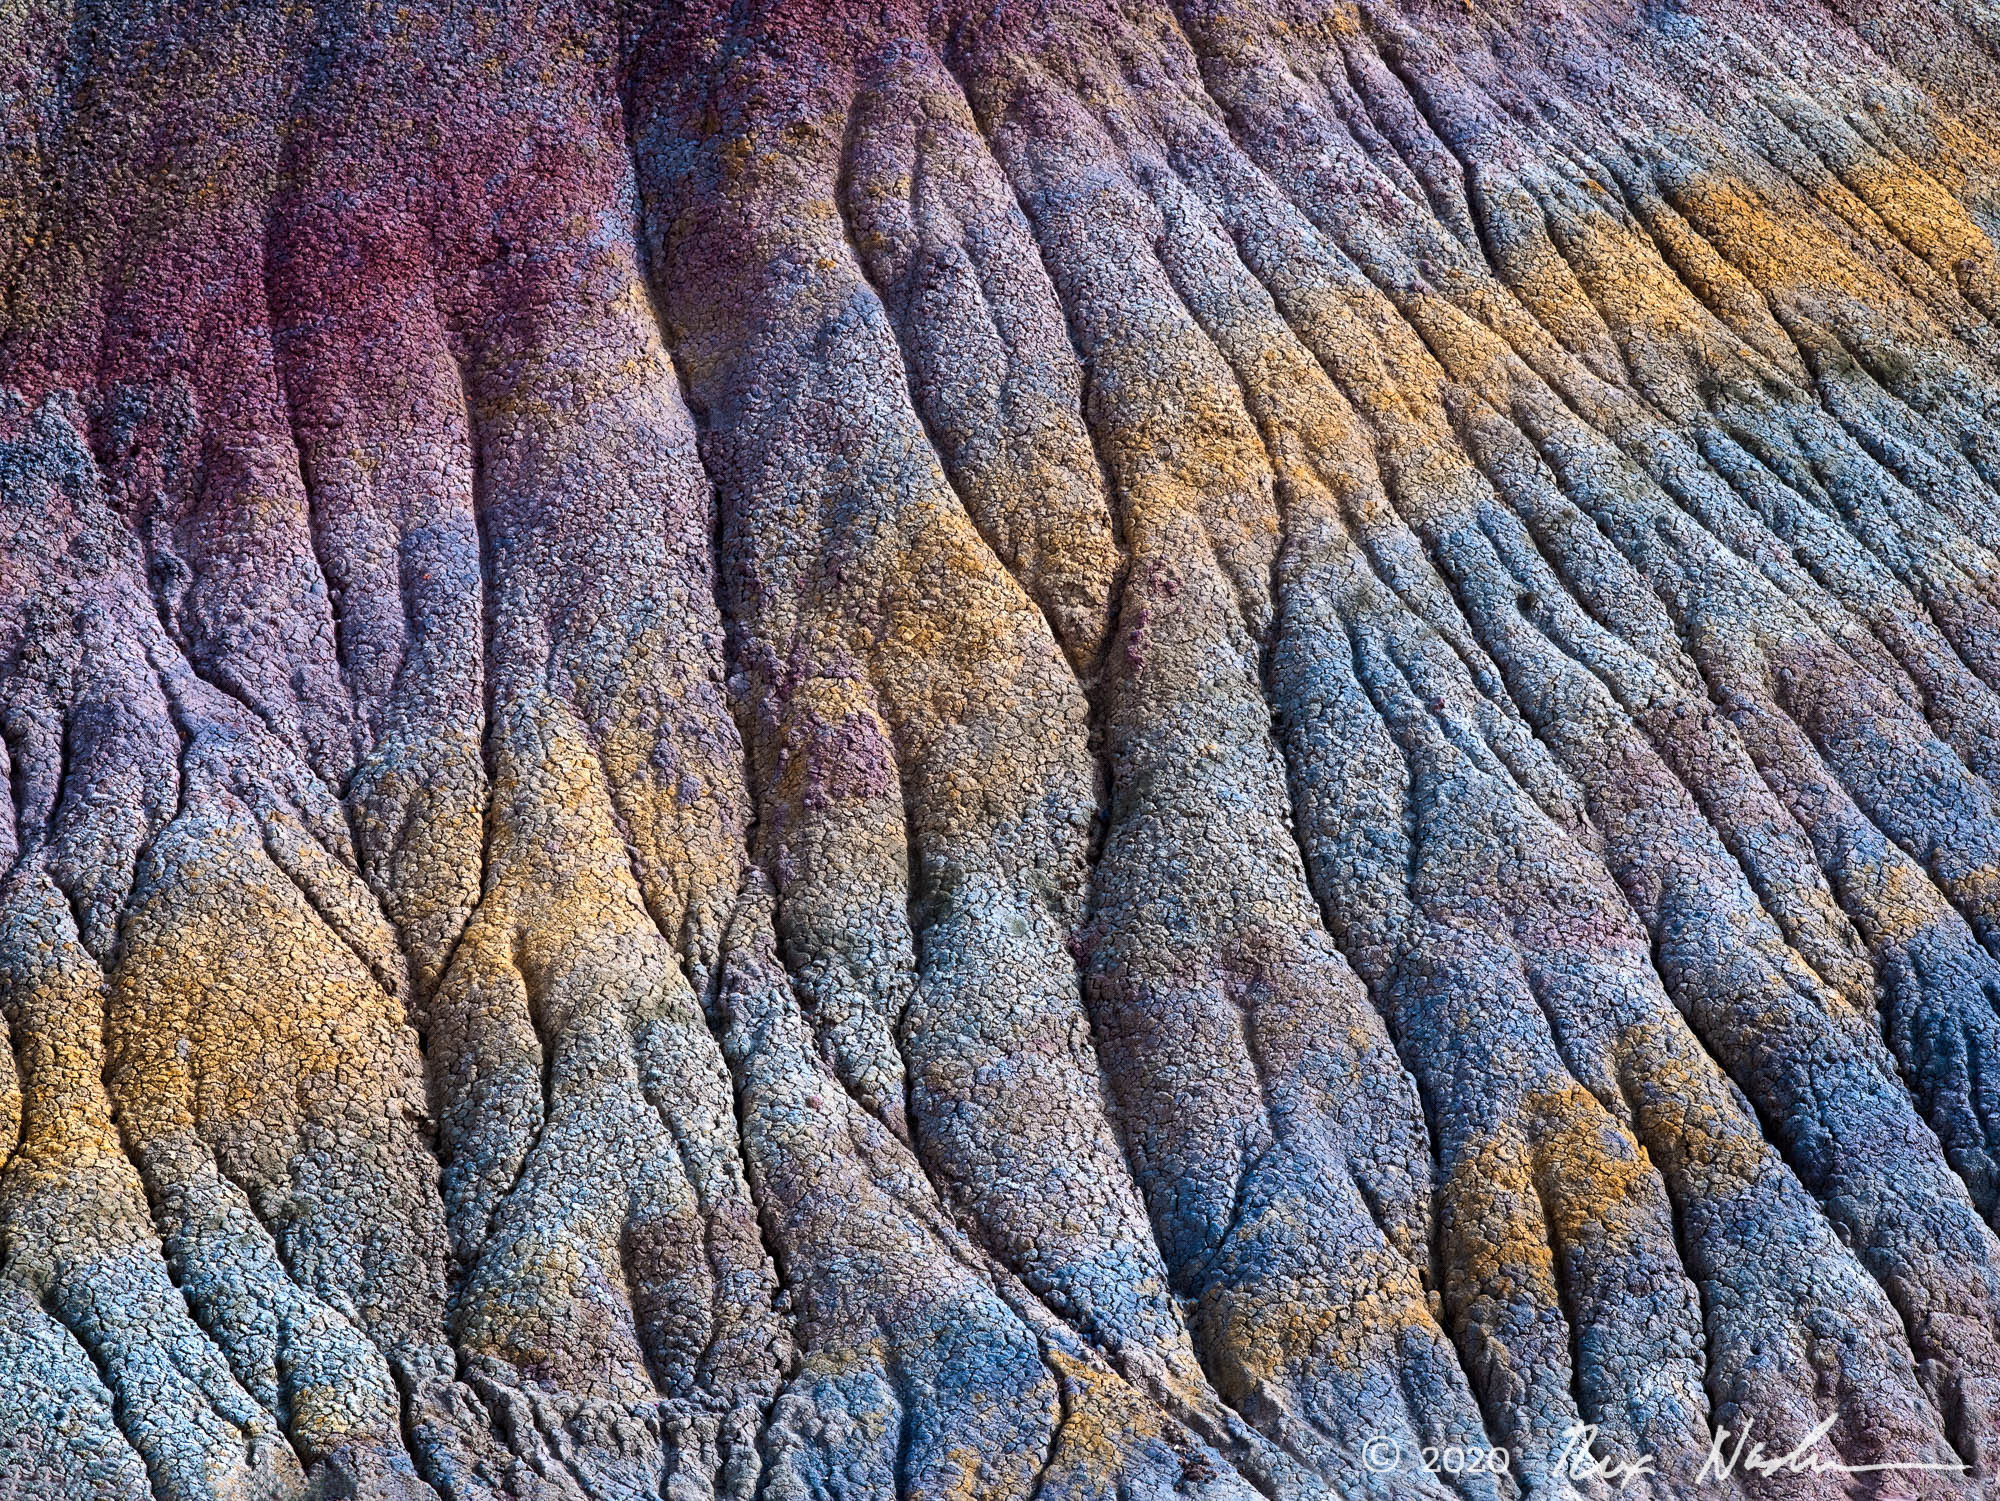 Spectrum - Paria Wilderness